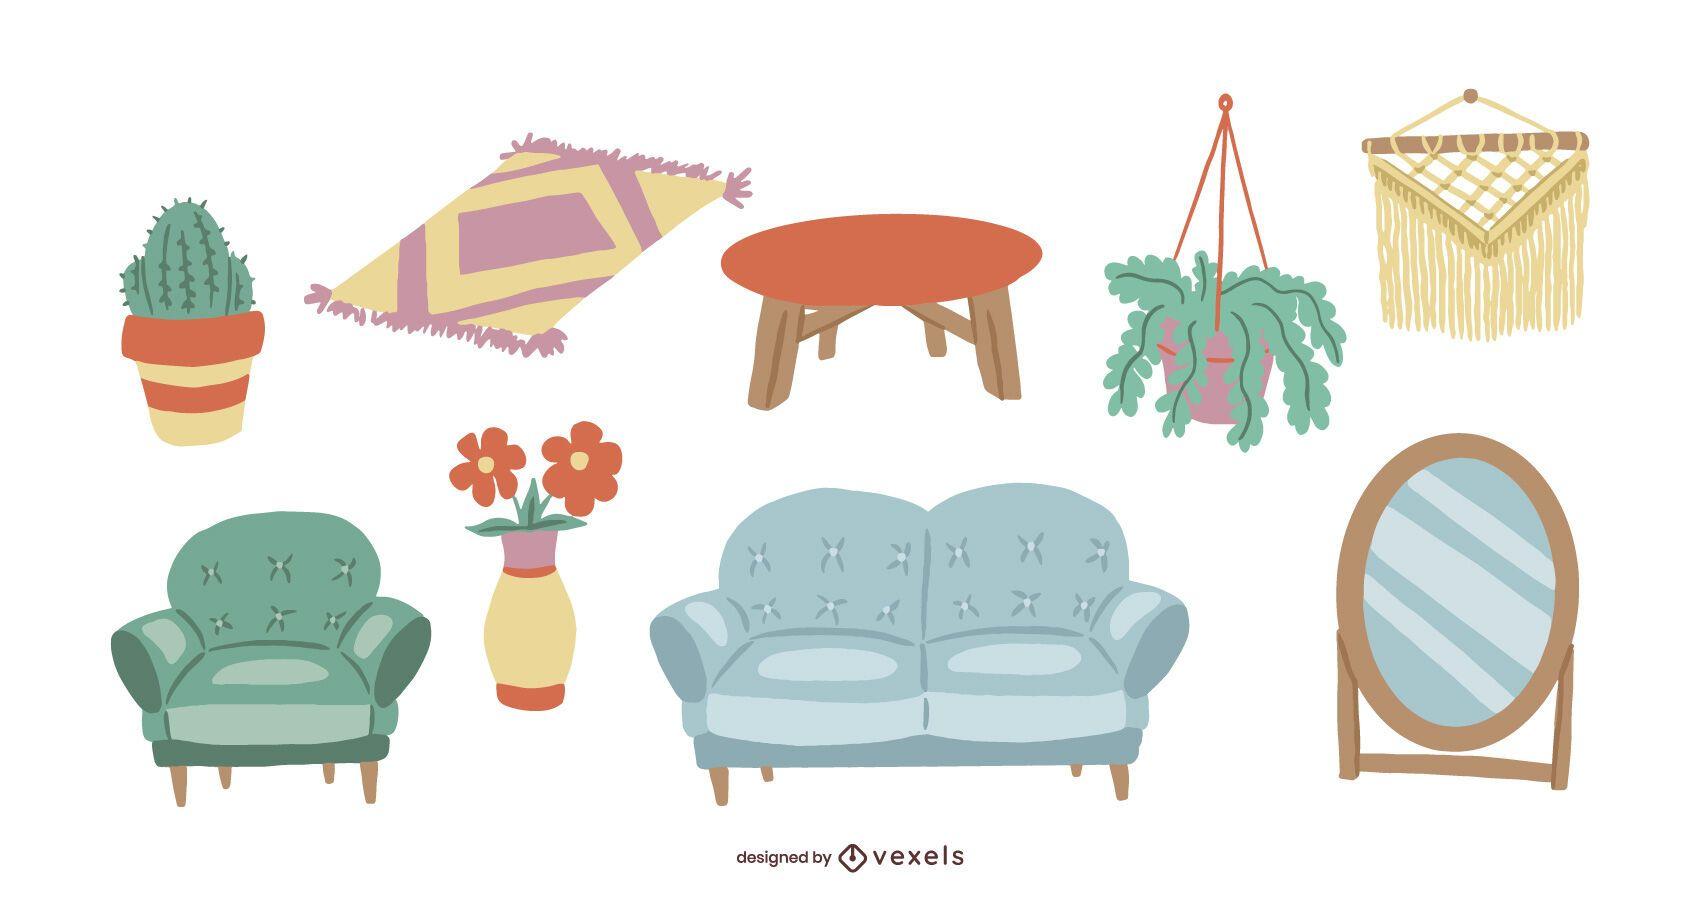 Interior furniture illustration set